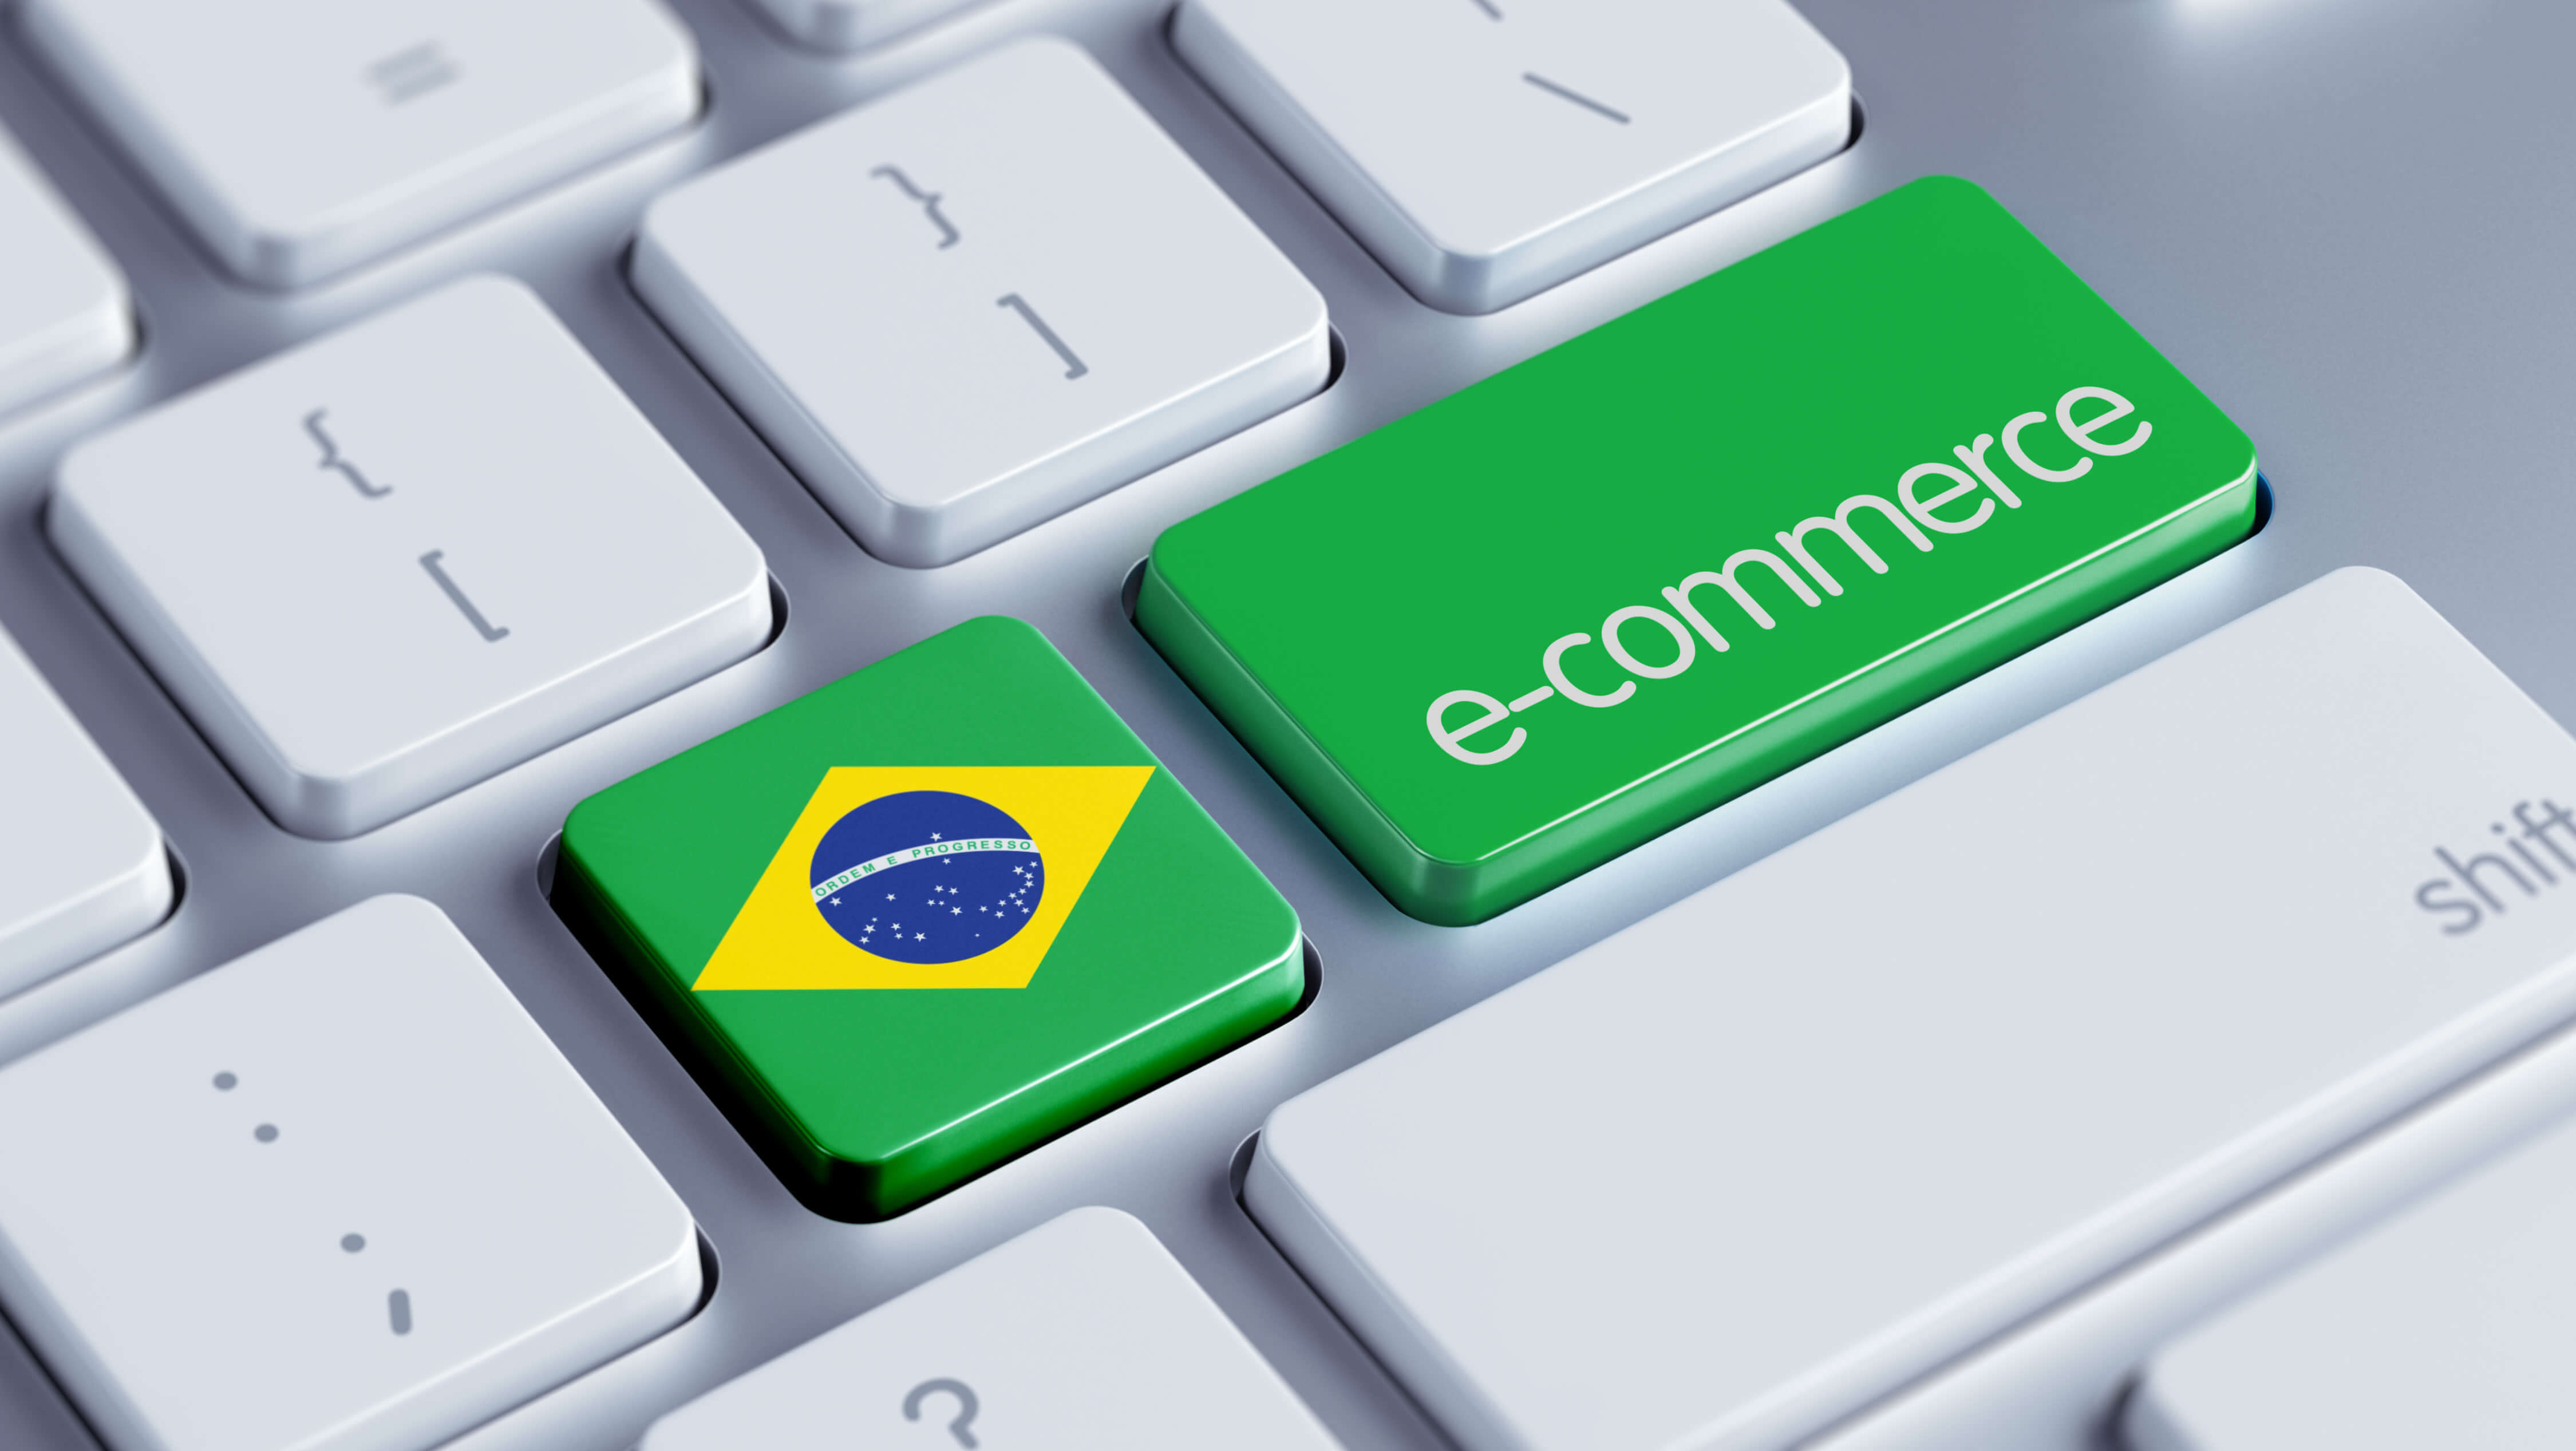 E-commerce cresce no Brasil